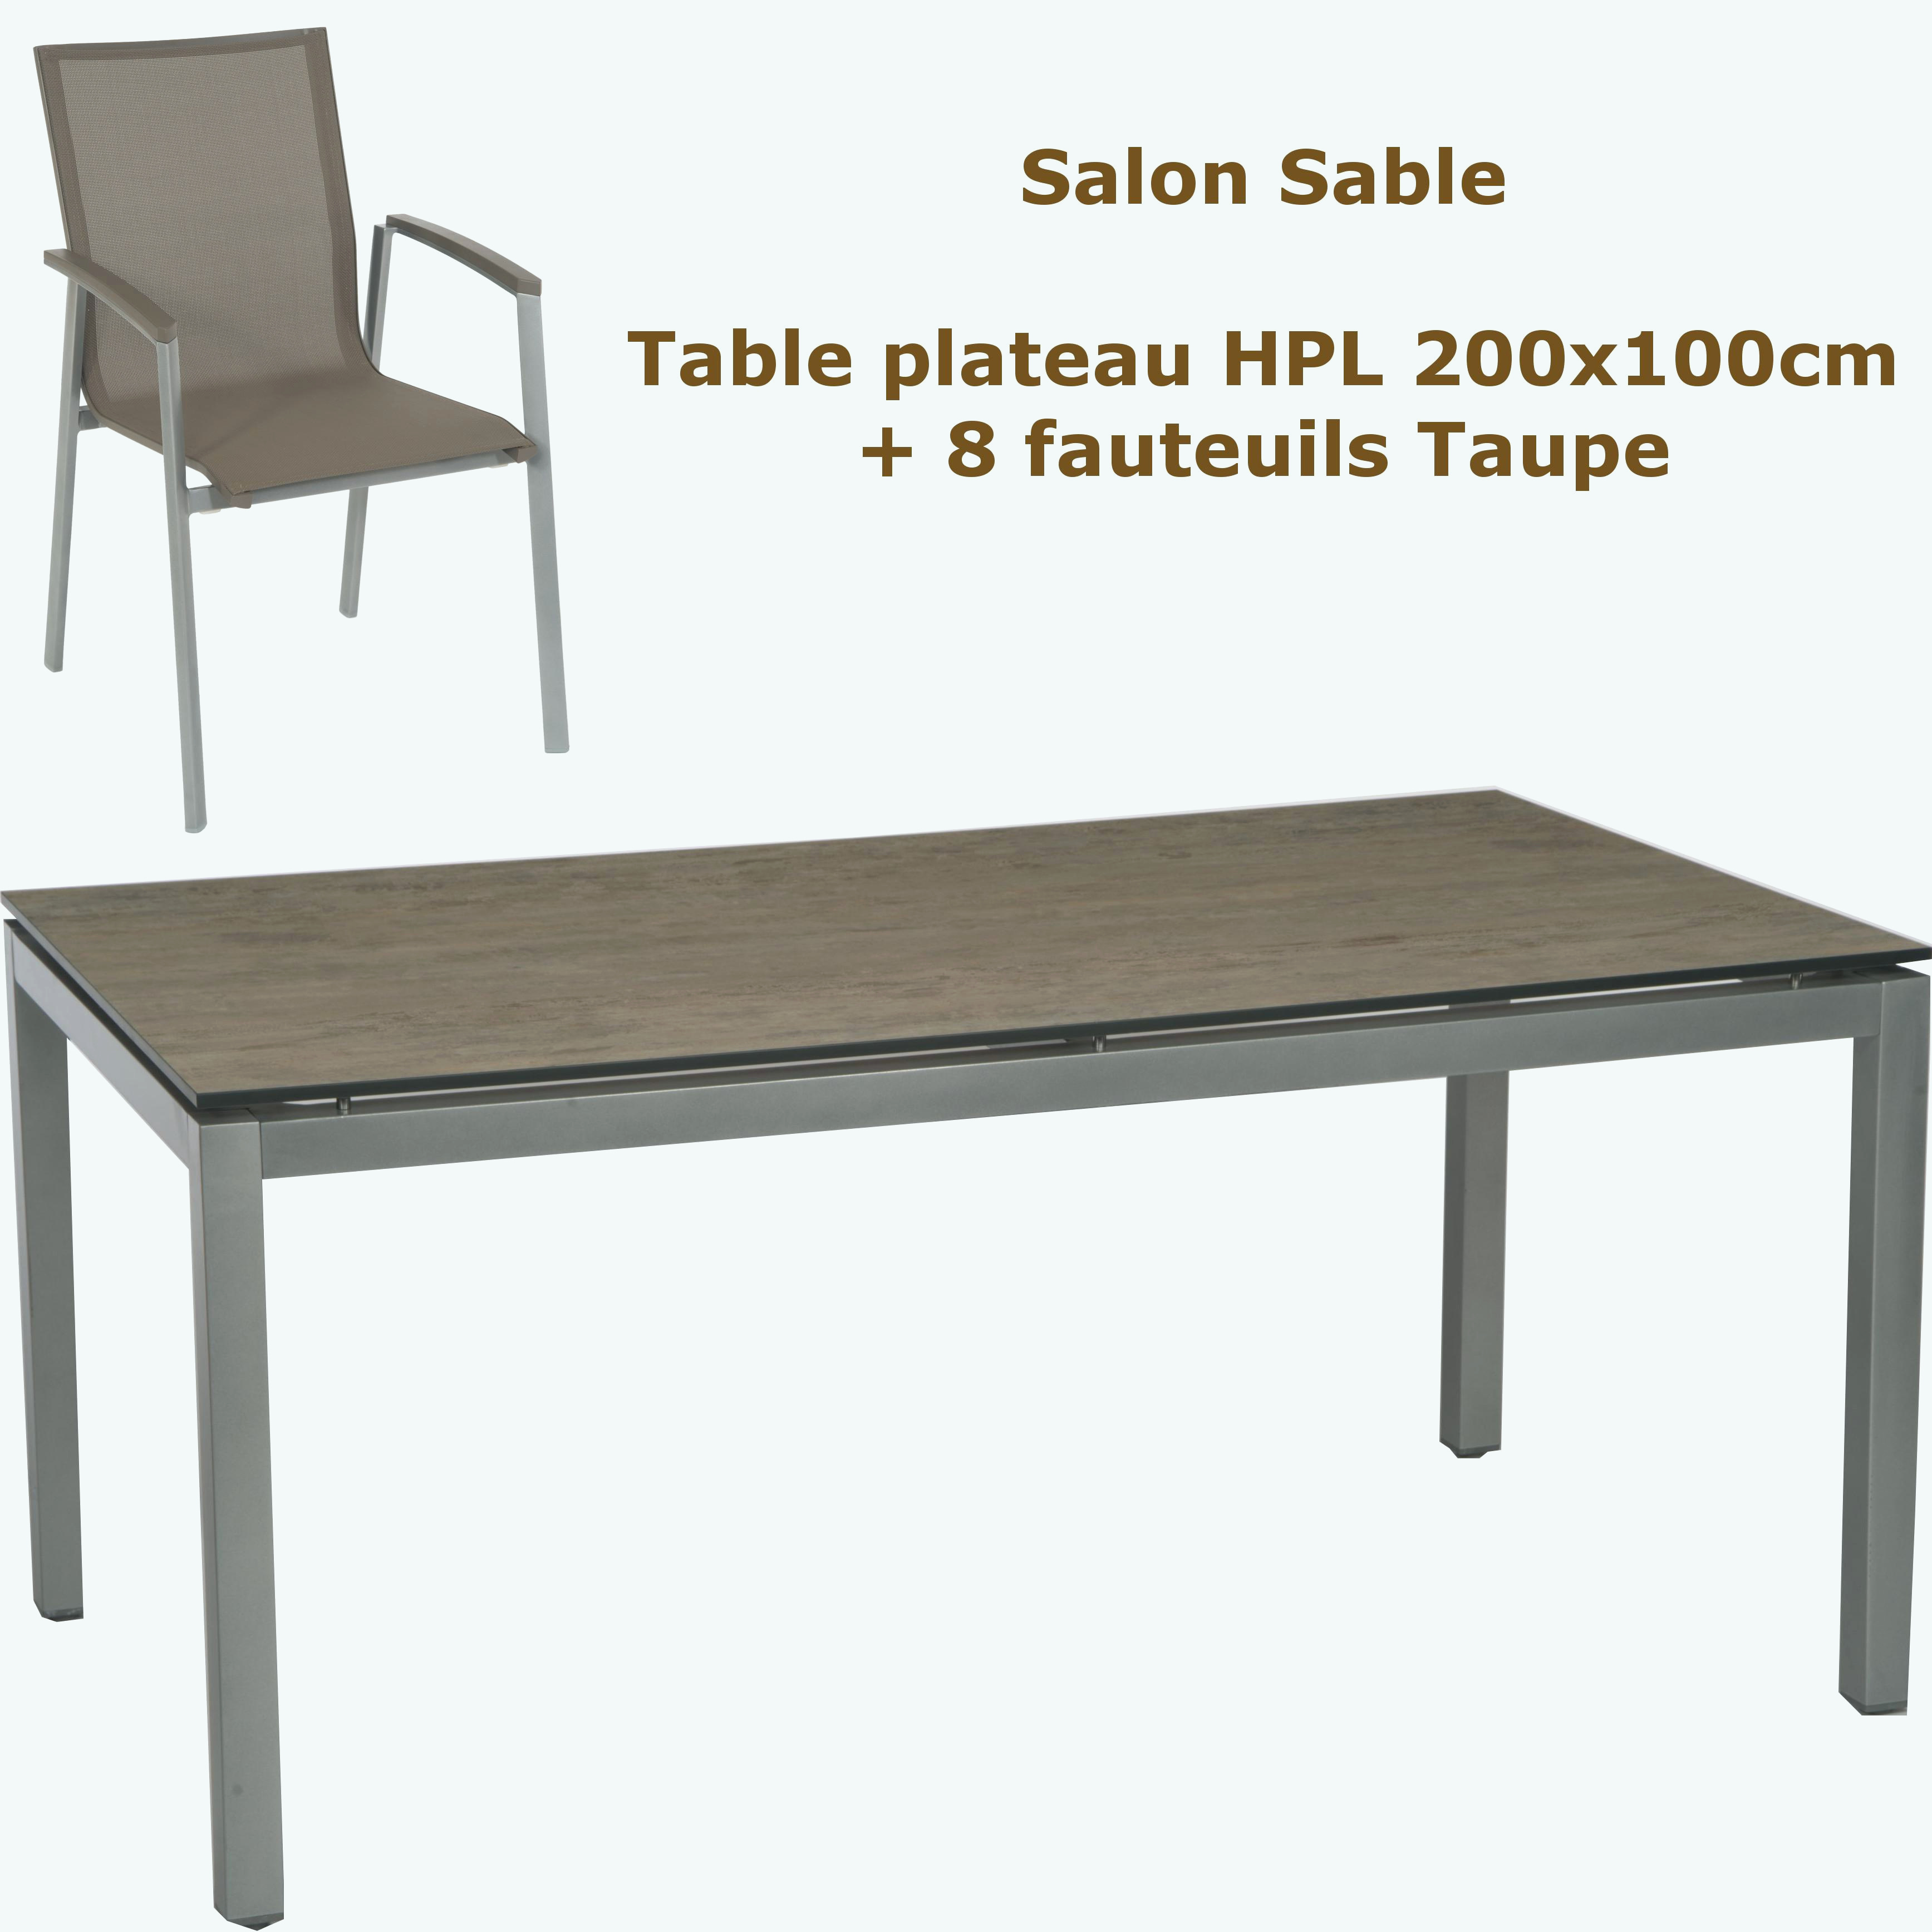 Table Kettler solde Beau Collection 41 Luxe Image De Table De Jardin En Aluminium